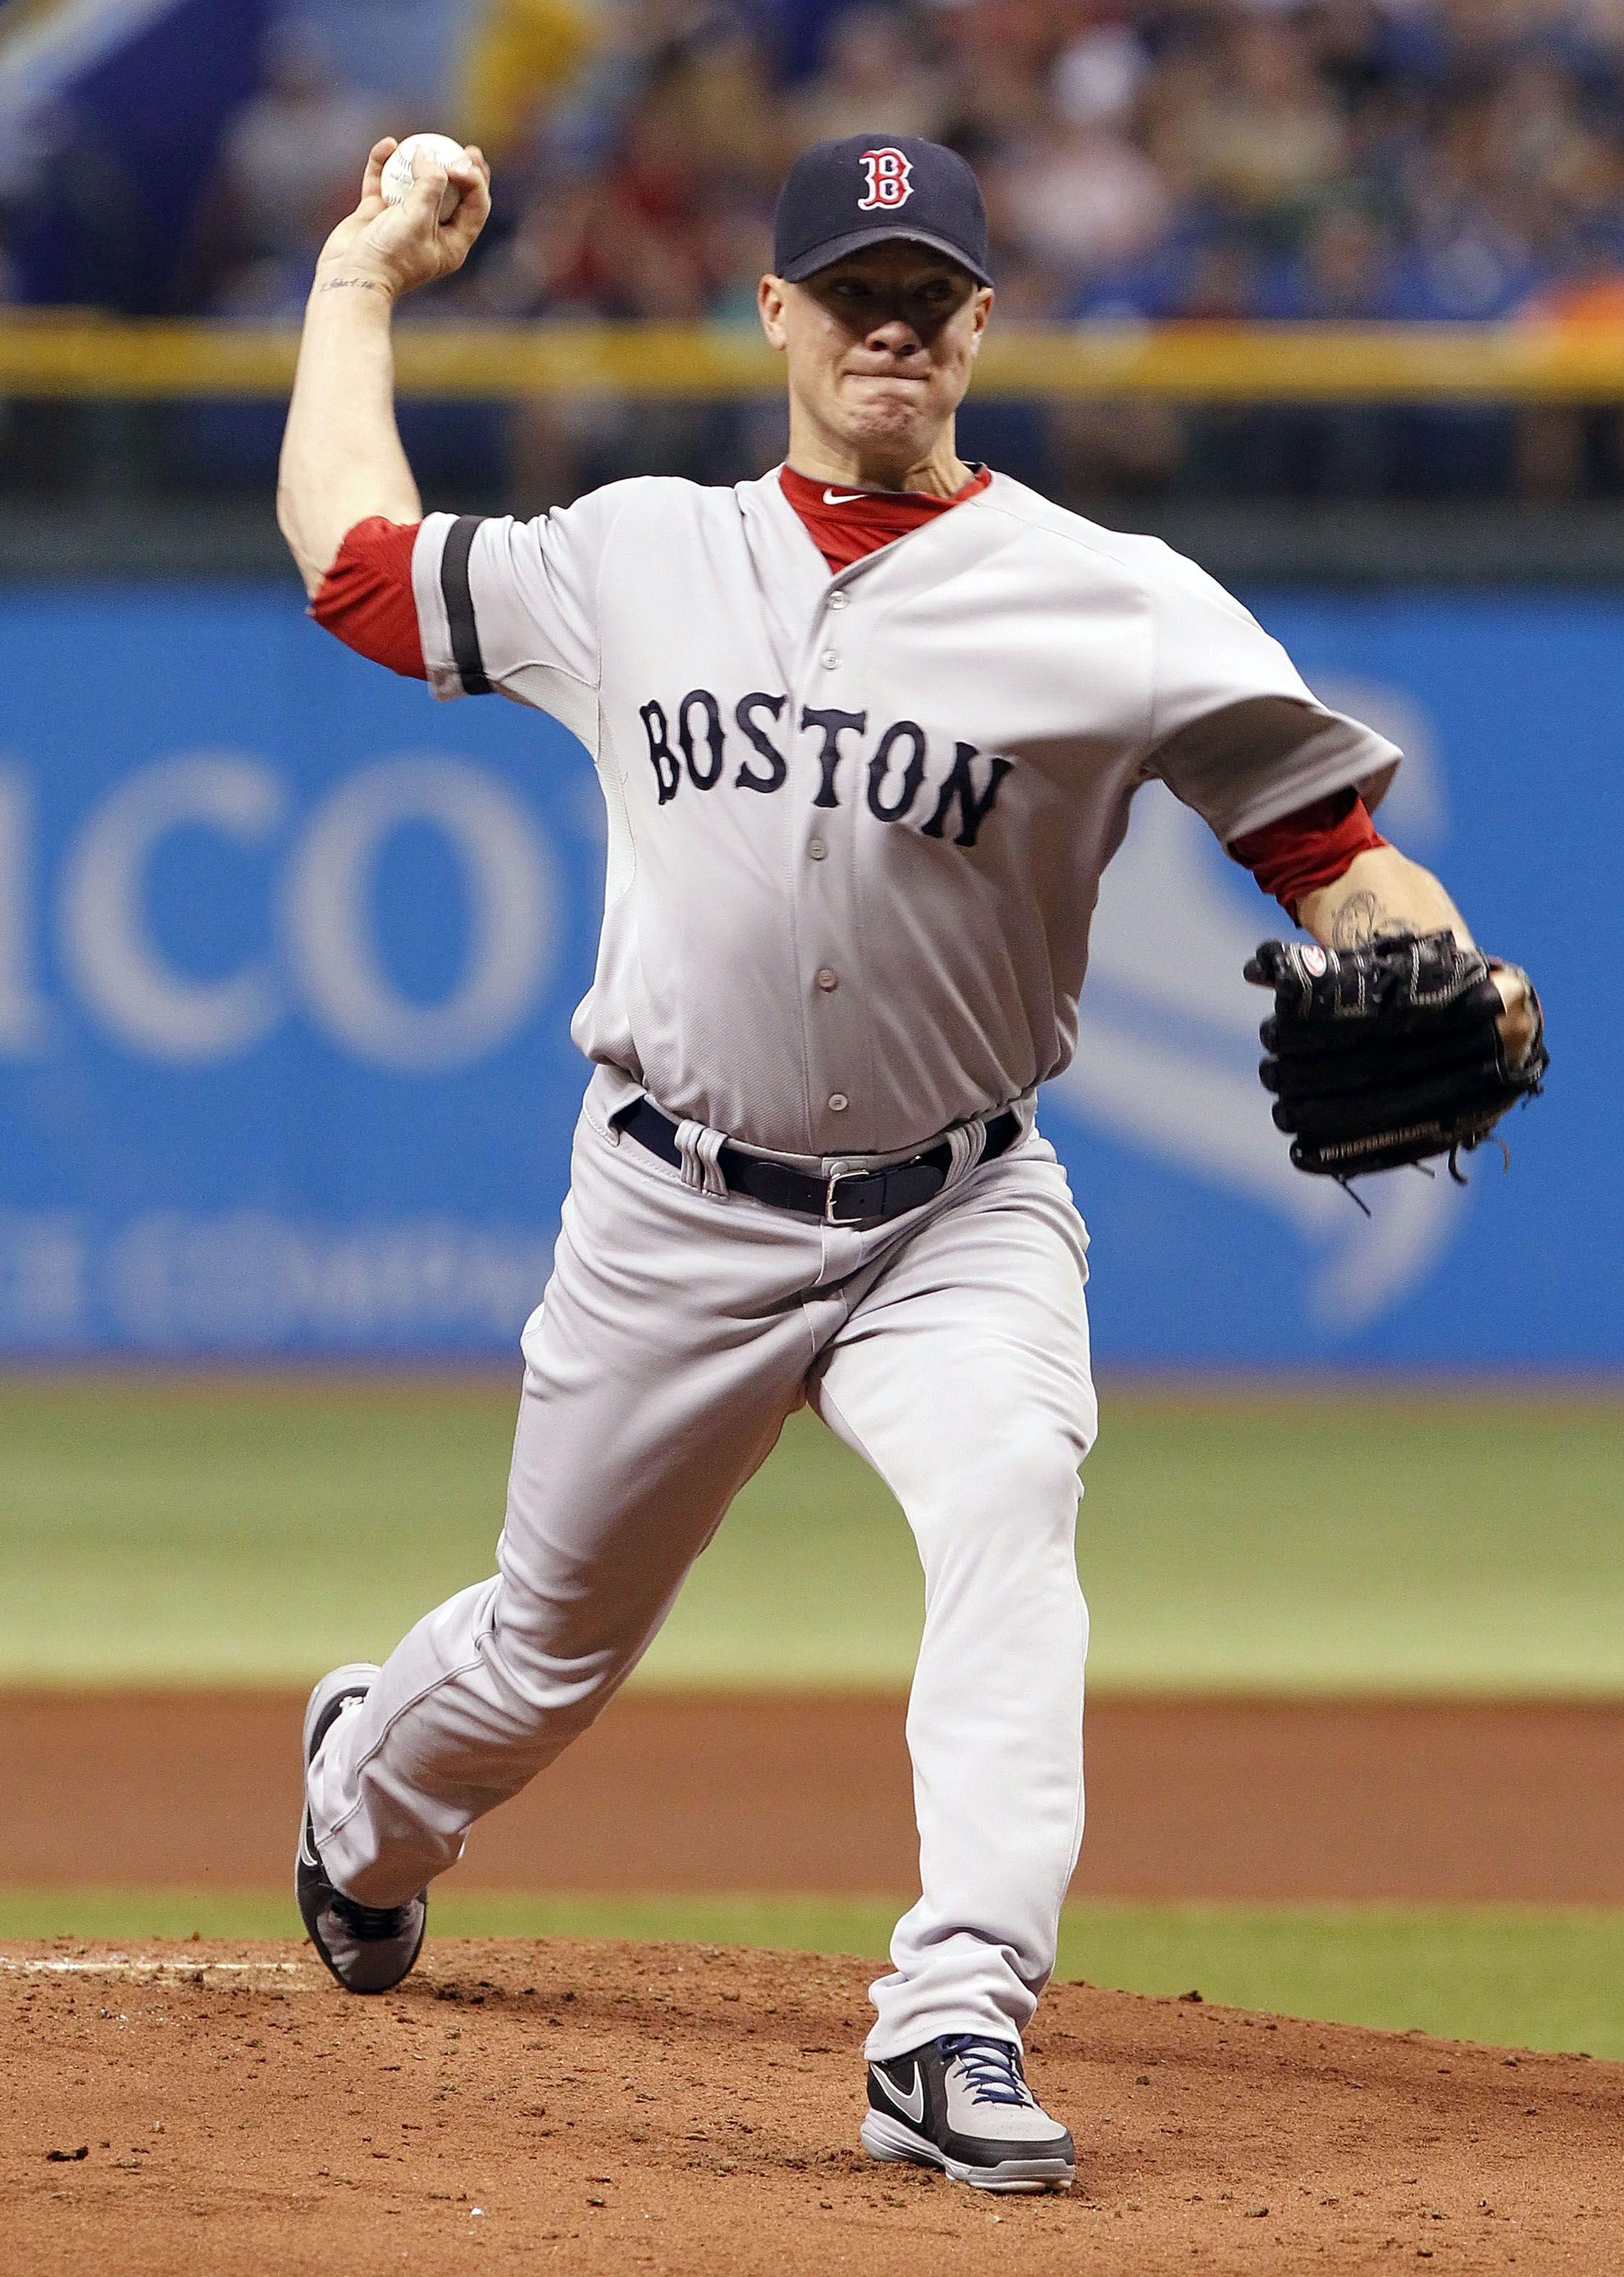 CrowdCam Hot Shot Boston Red Sox starting pitcher Jake